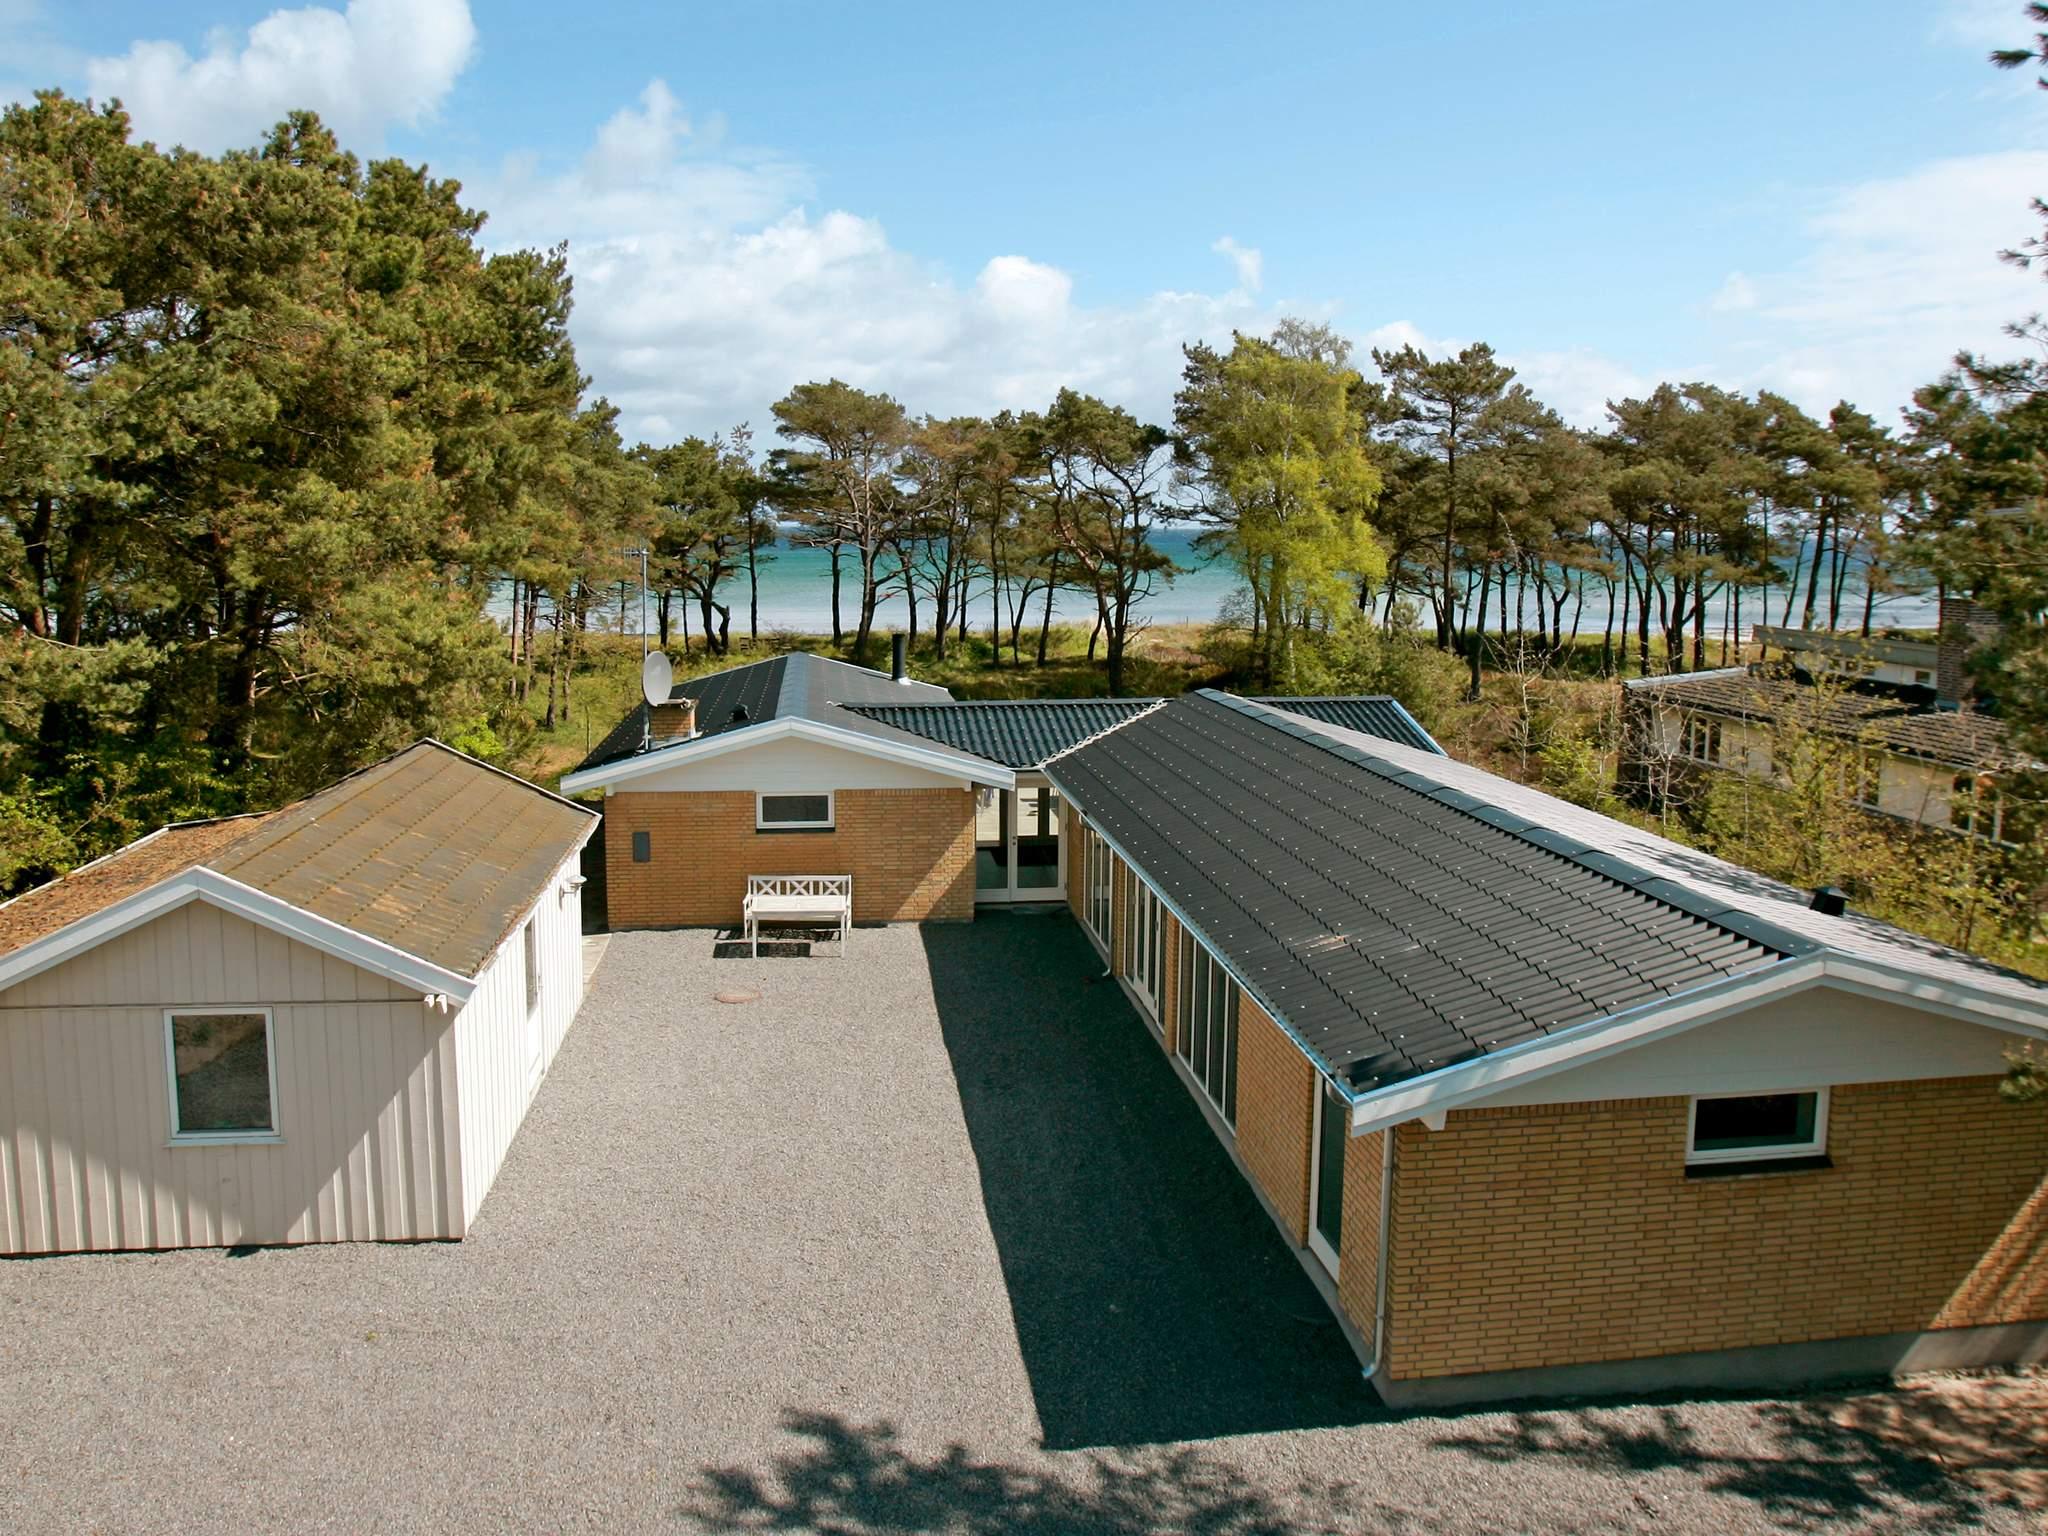 Ferienhaus Balka Strand (586595), Balke, , Bornholm, Dänemark, Bild 17